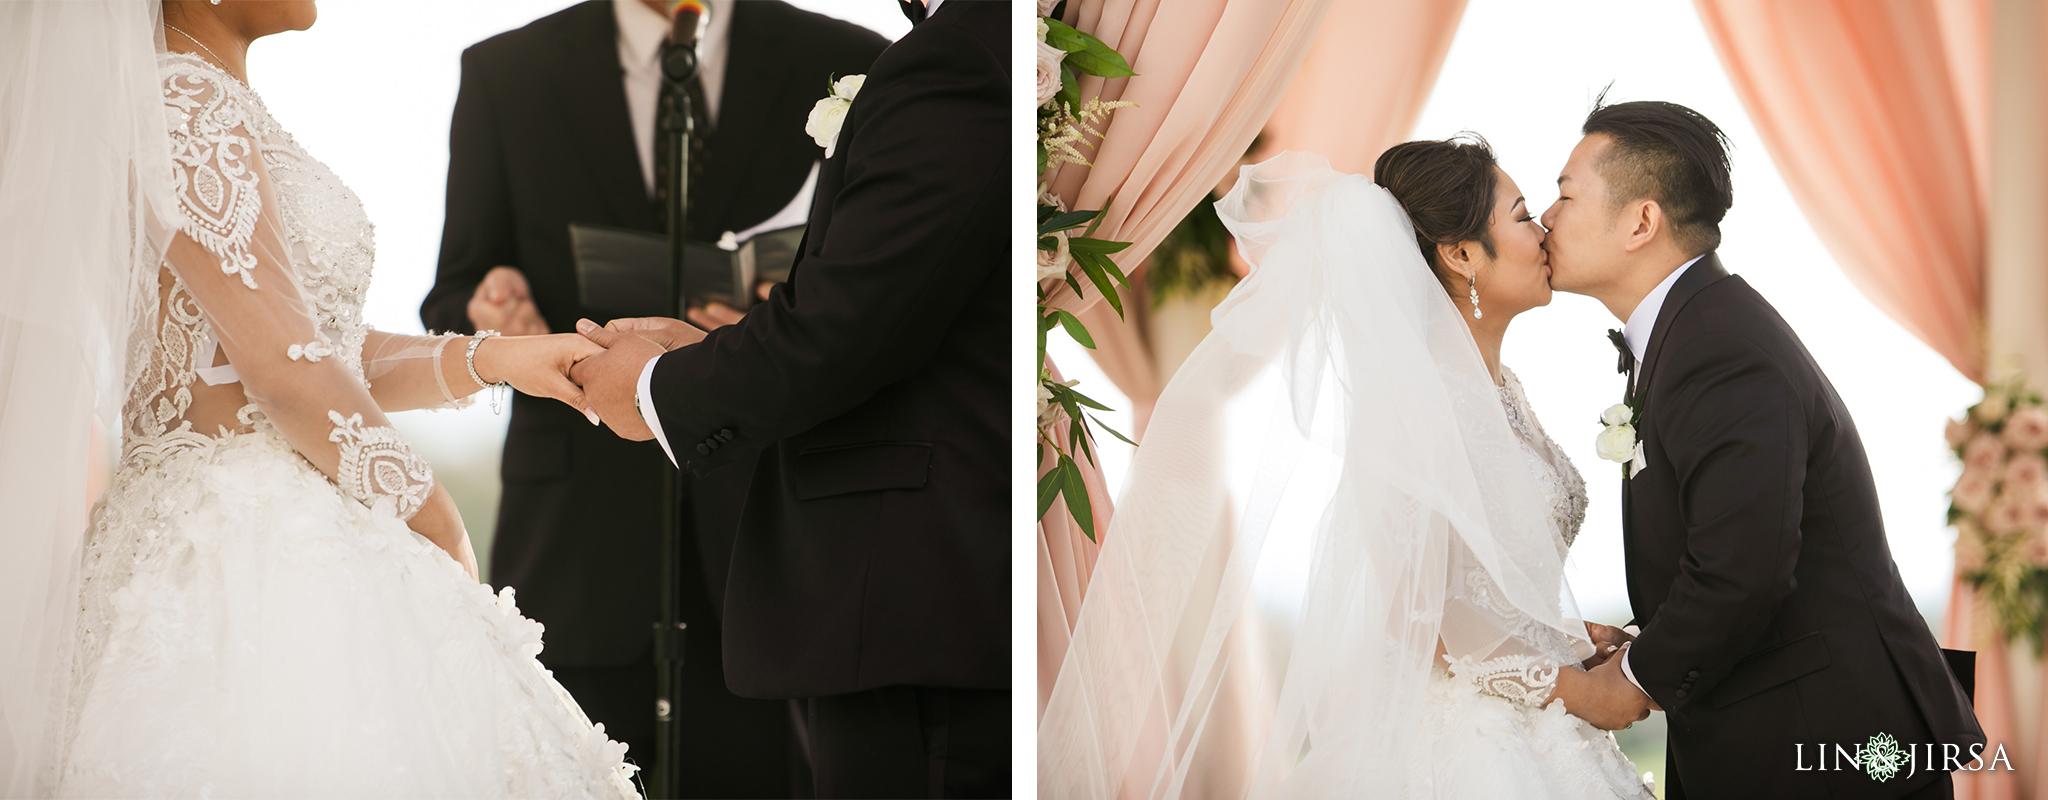 17 The Newport Beach Marriott Hotel Wedding Photography